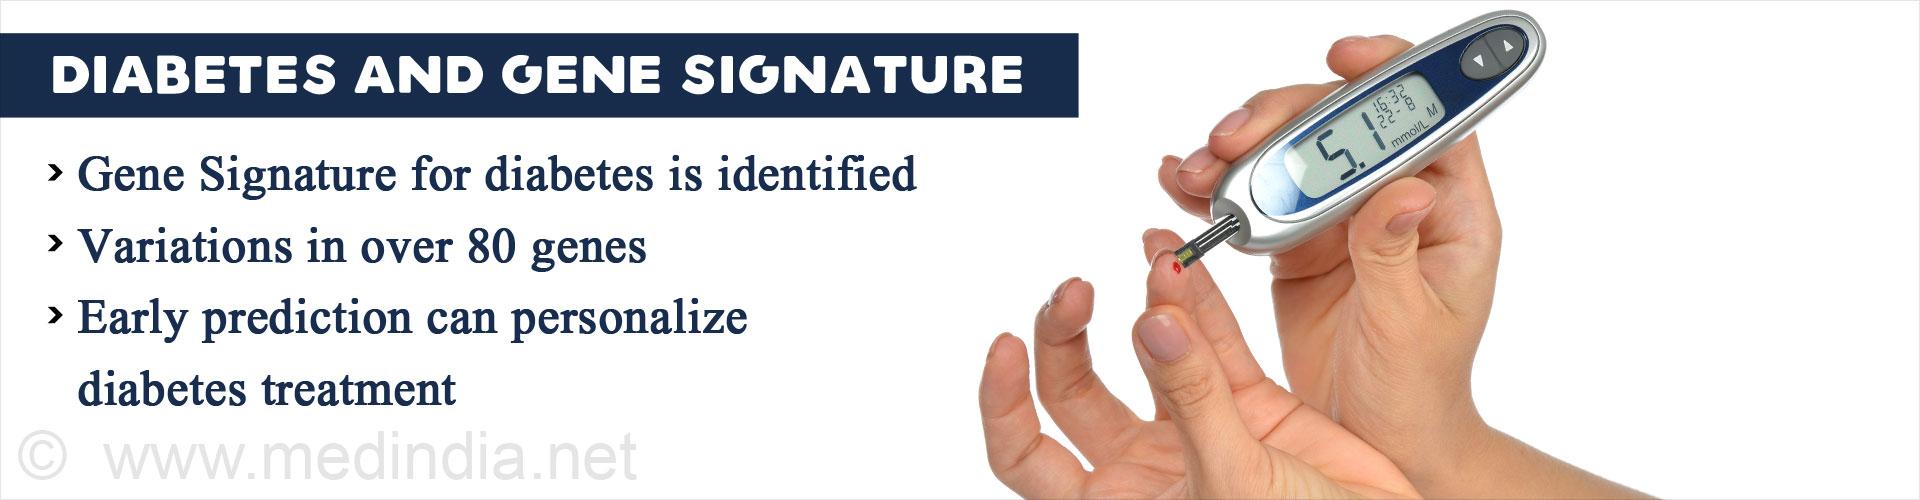 Gene Signature Identified for Diabetes Prediction